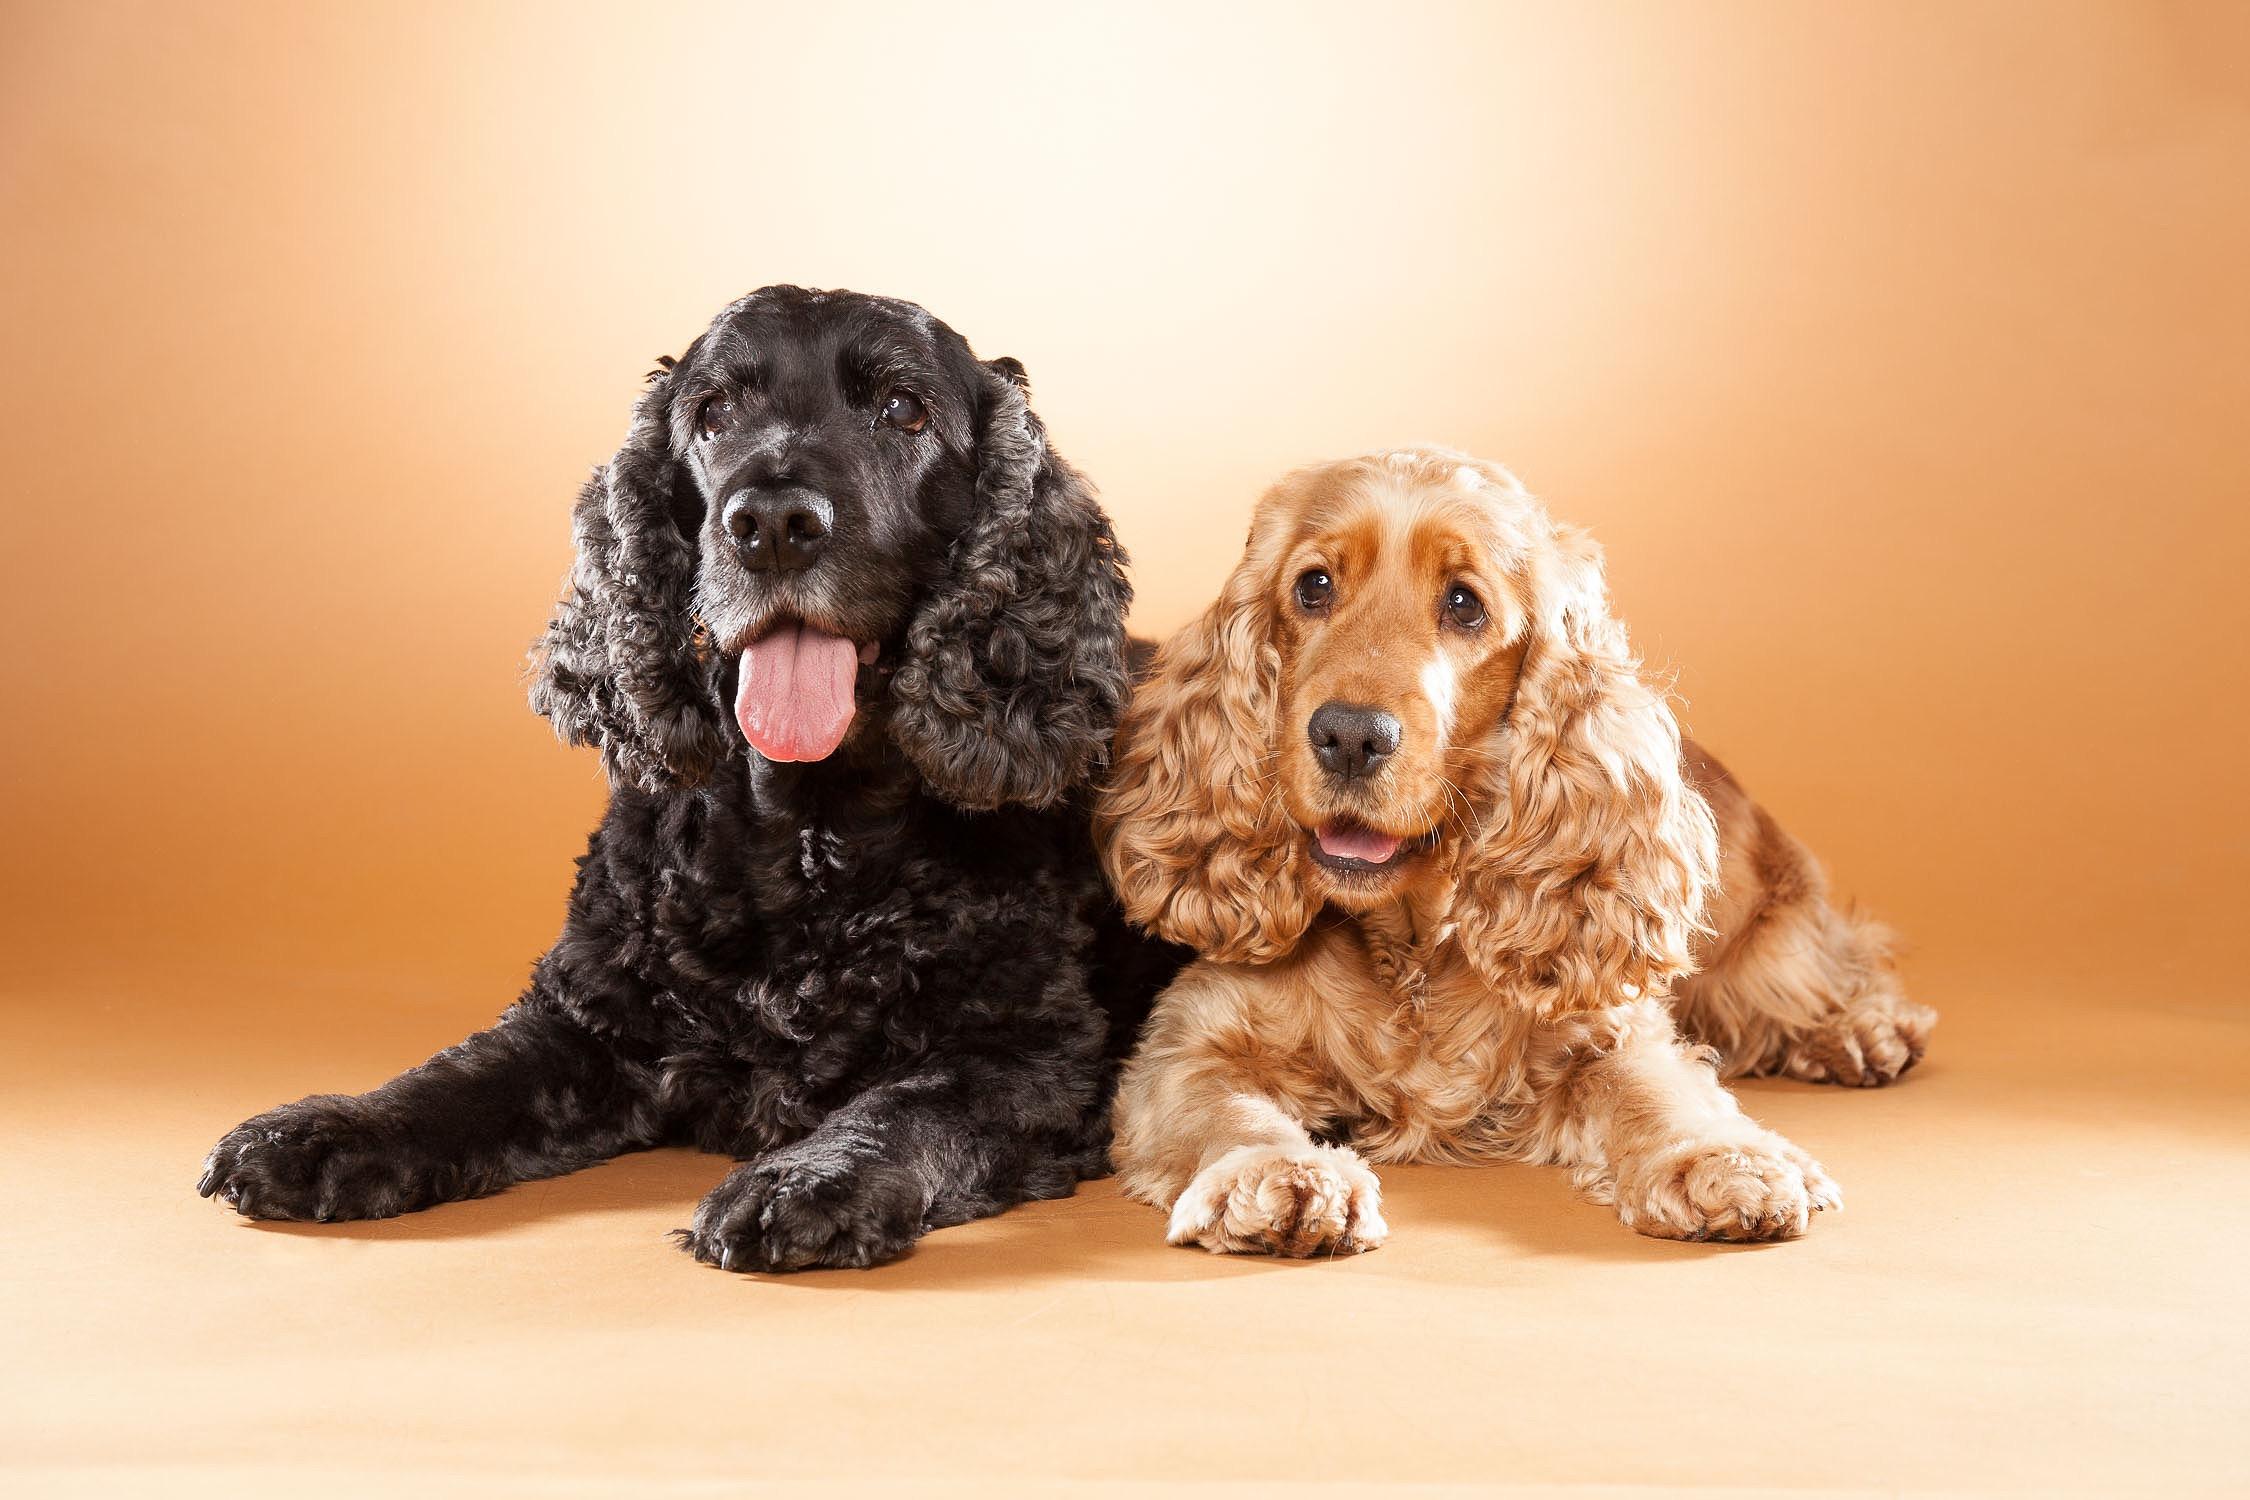 hund-hundefotograf-hundefotografering-fotograf-hodnedesign-pål-hodne--3.jpg